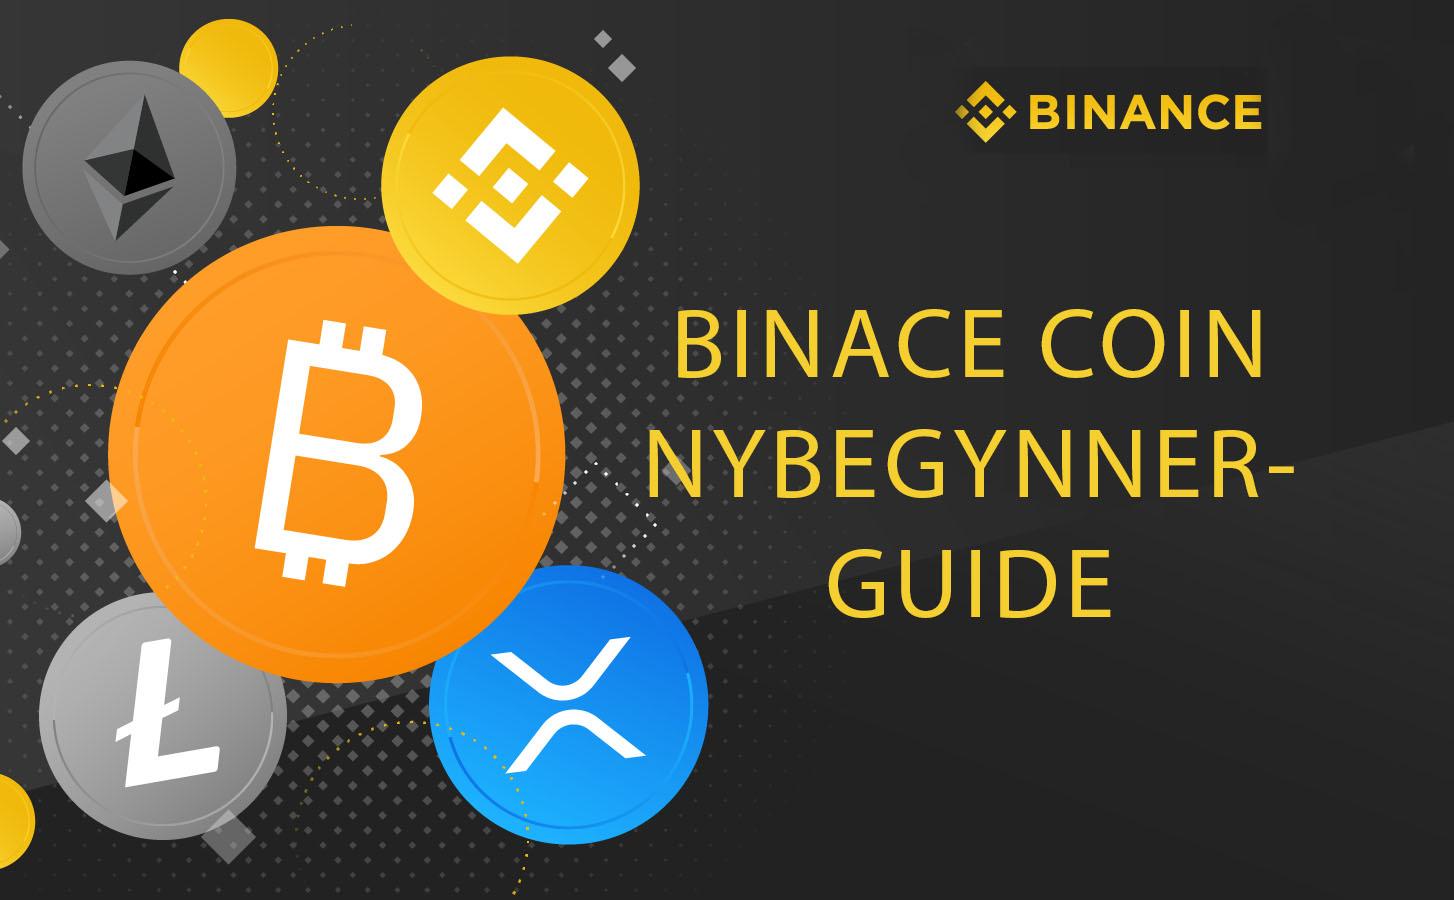 binance coin nybegynnerguide